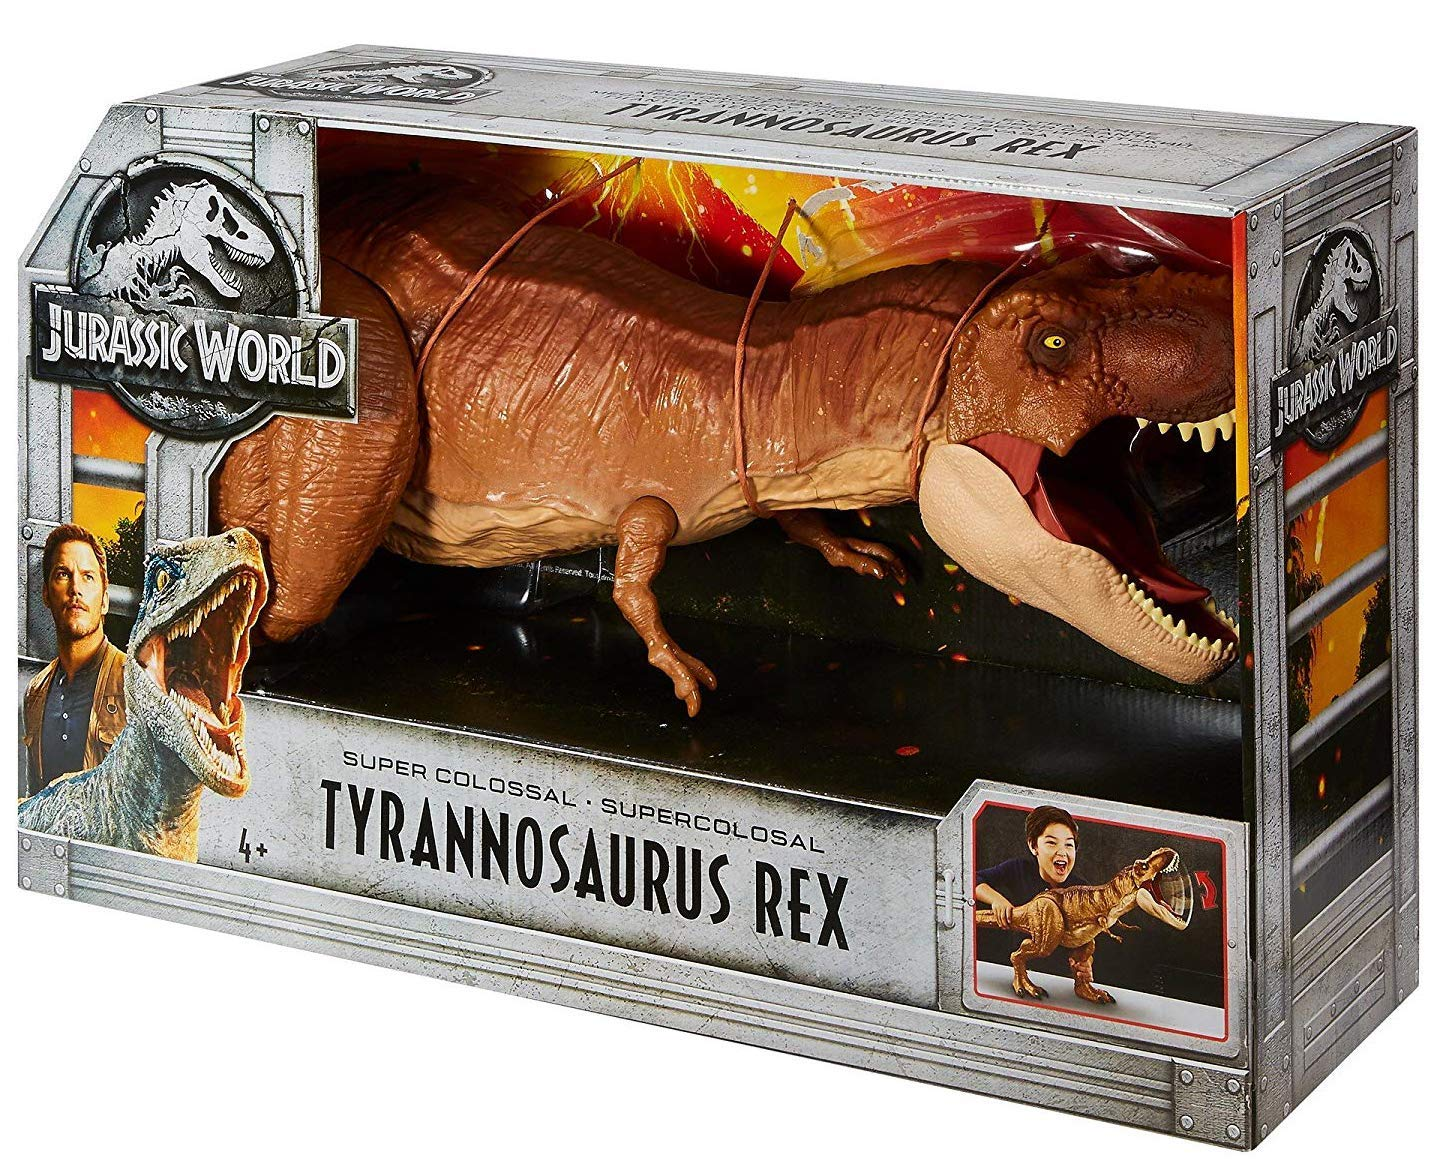 Jurassic World FMY70 Thrash N Throw Tyrannosaurus Rex Figure